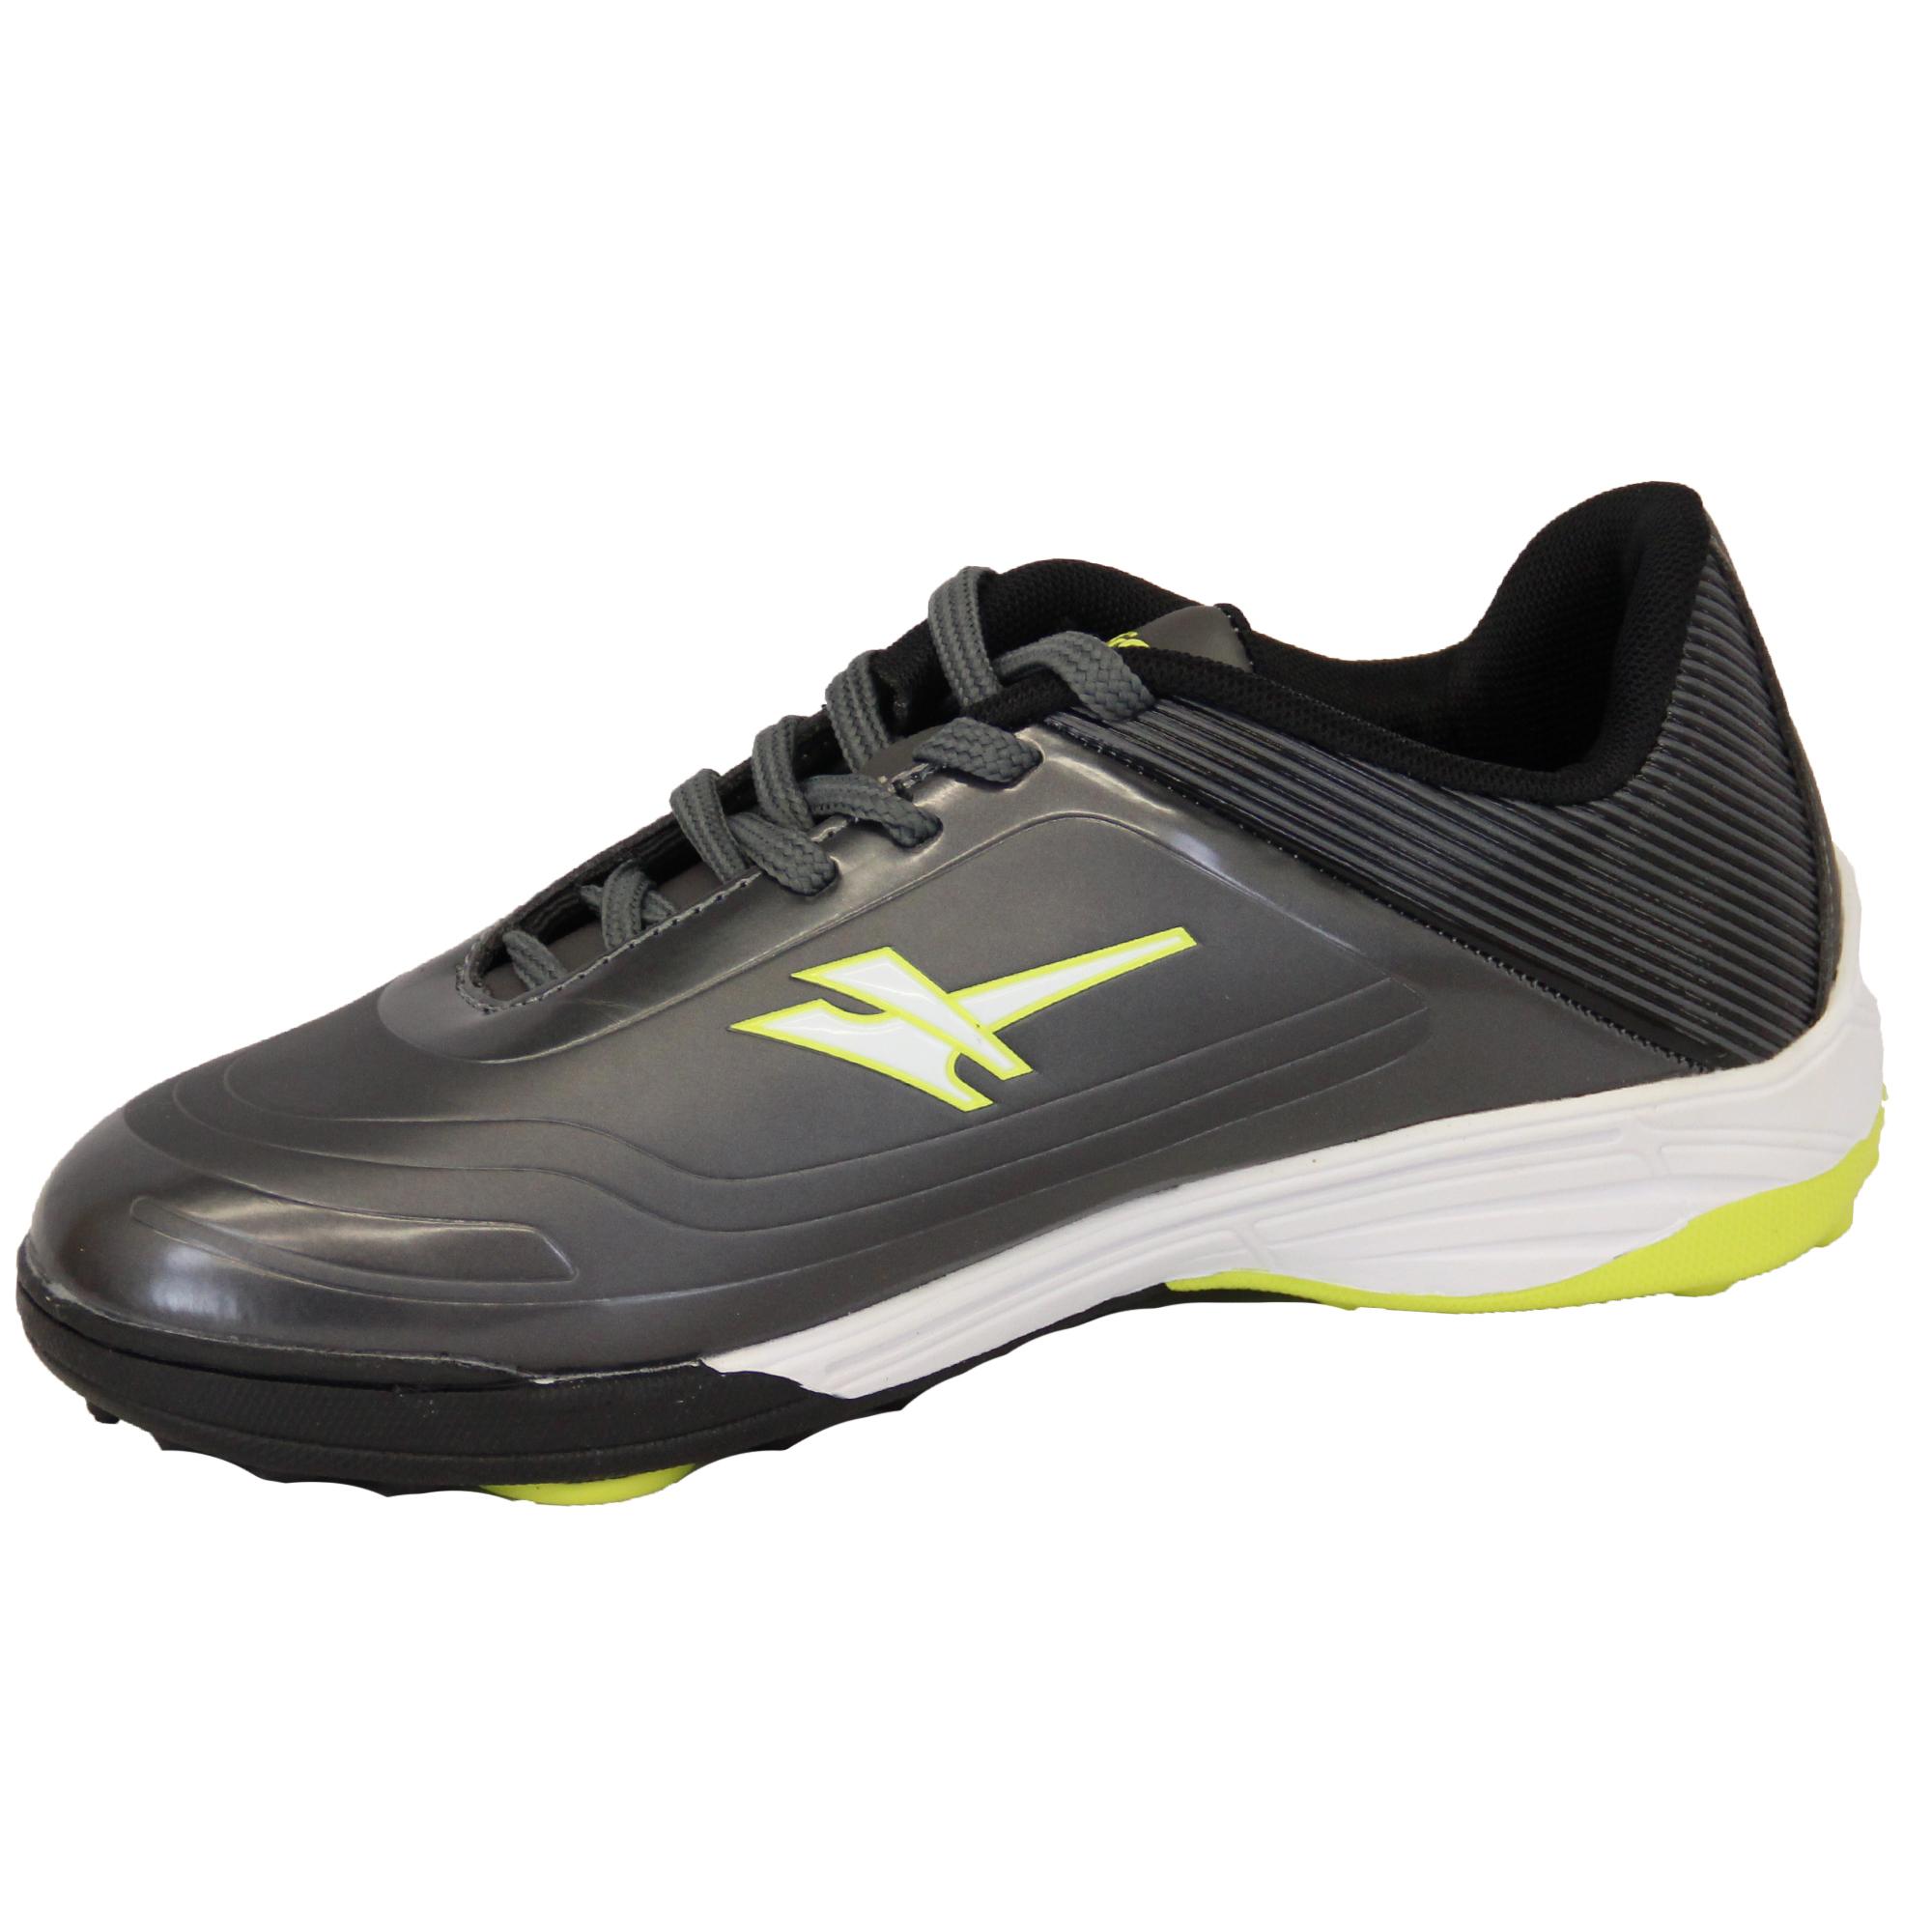 boys trainers gola astro turf football sports shoes